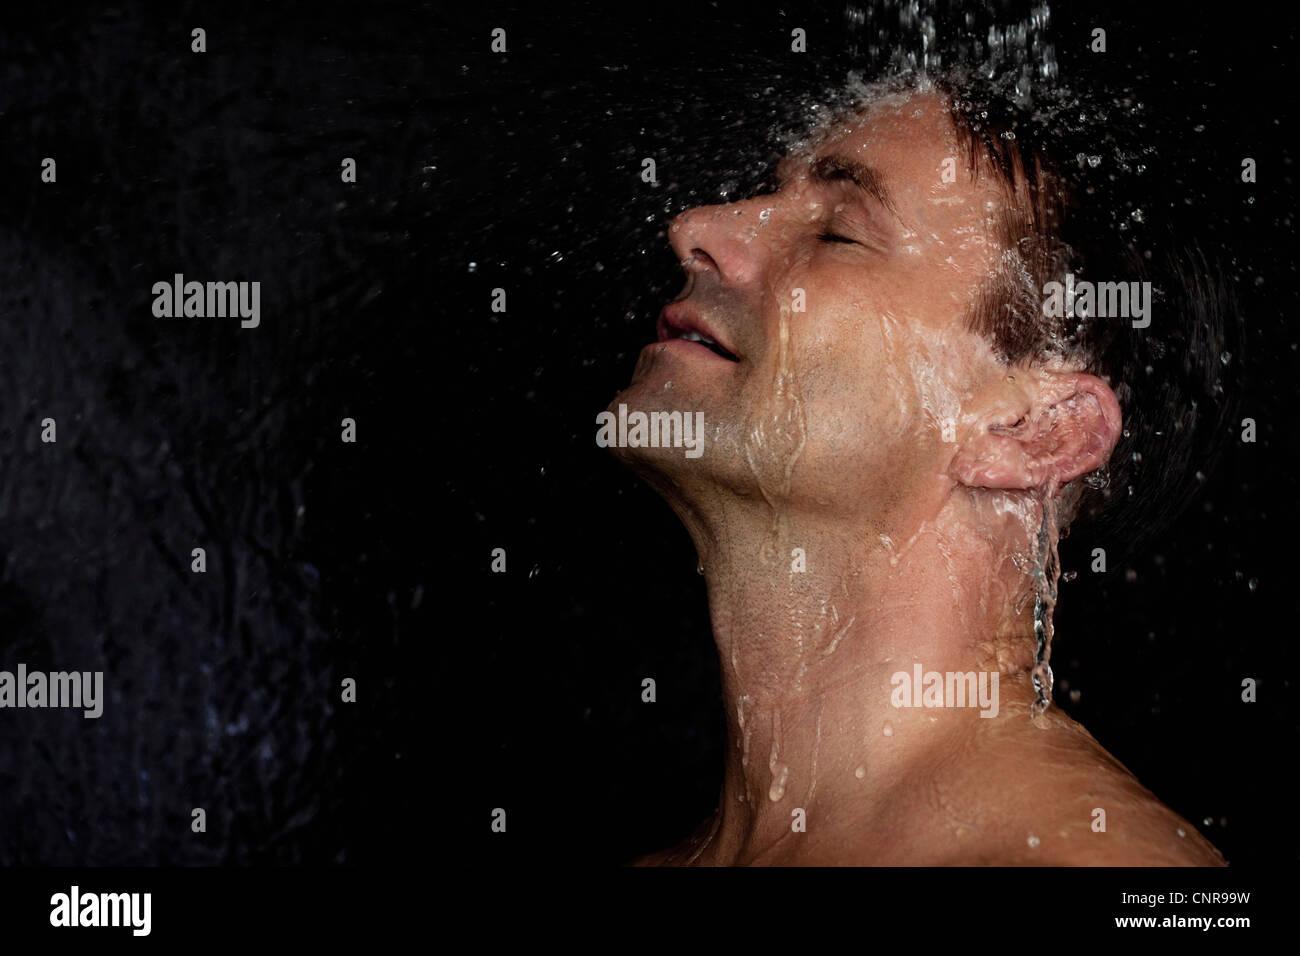 man-washing-his-hair-in-shower-CNR99W.jp